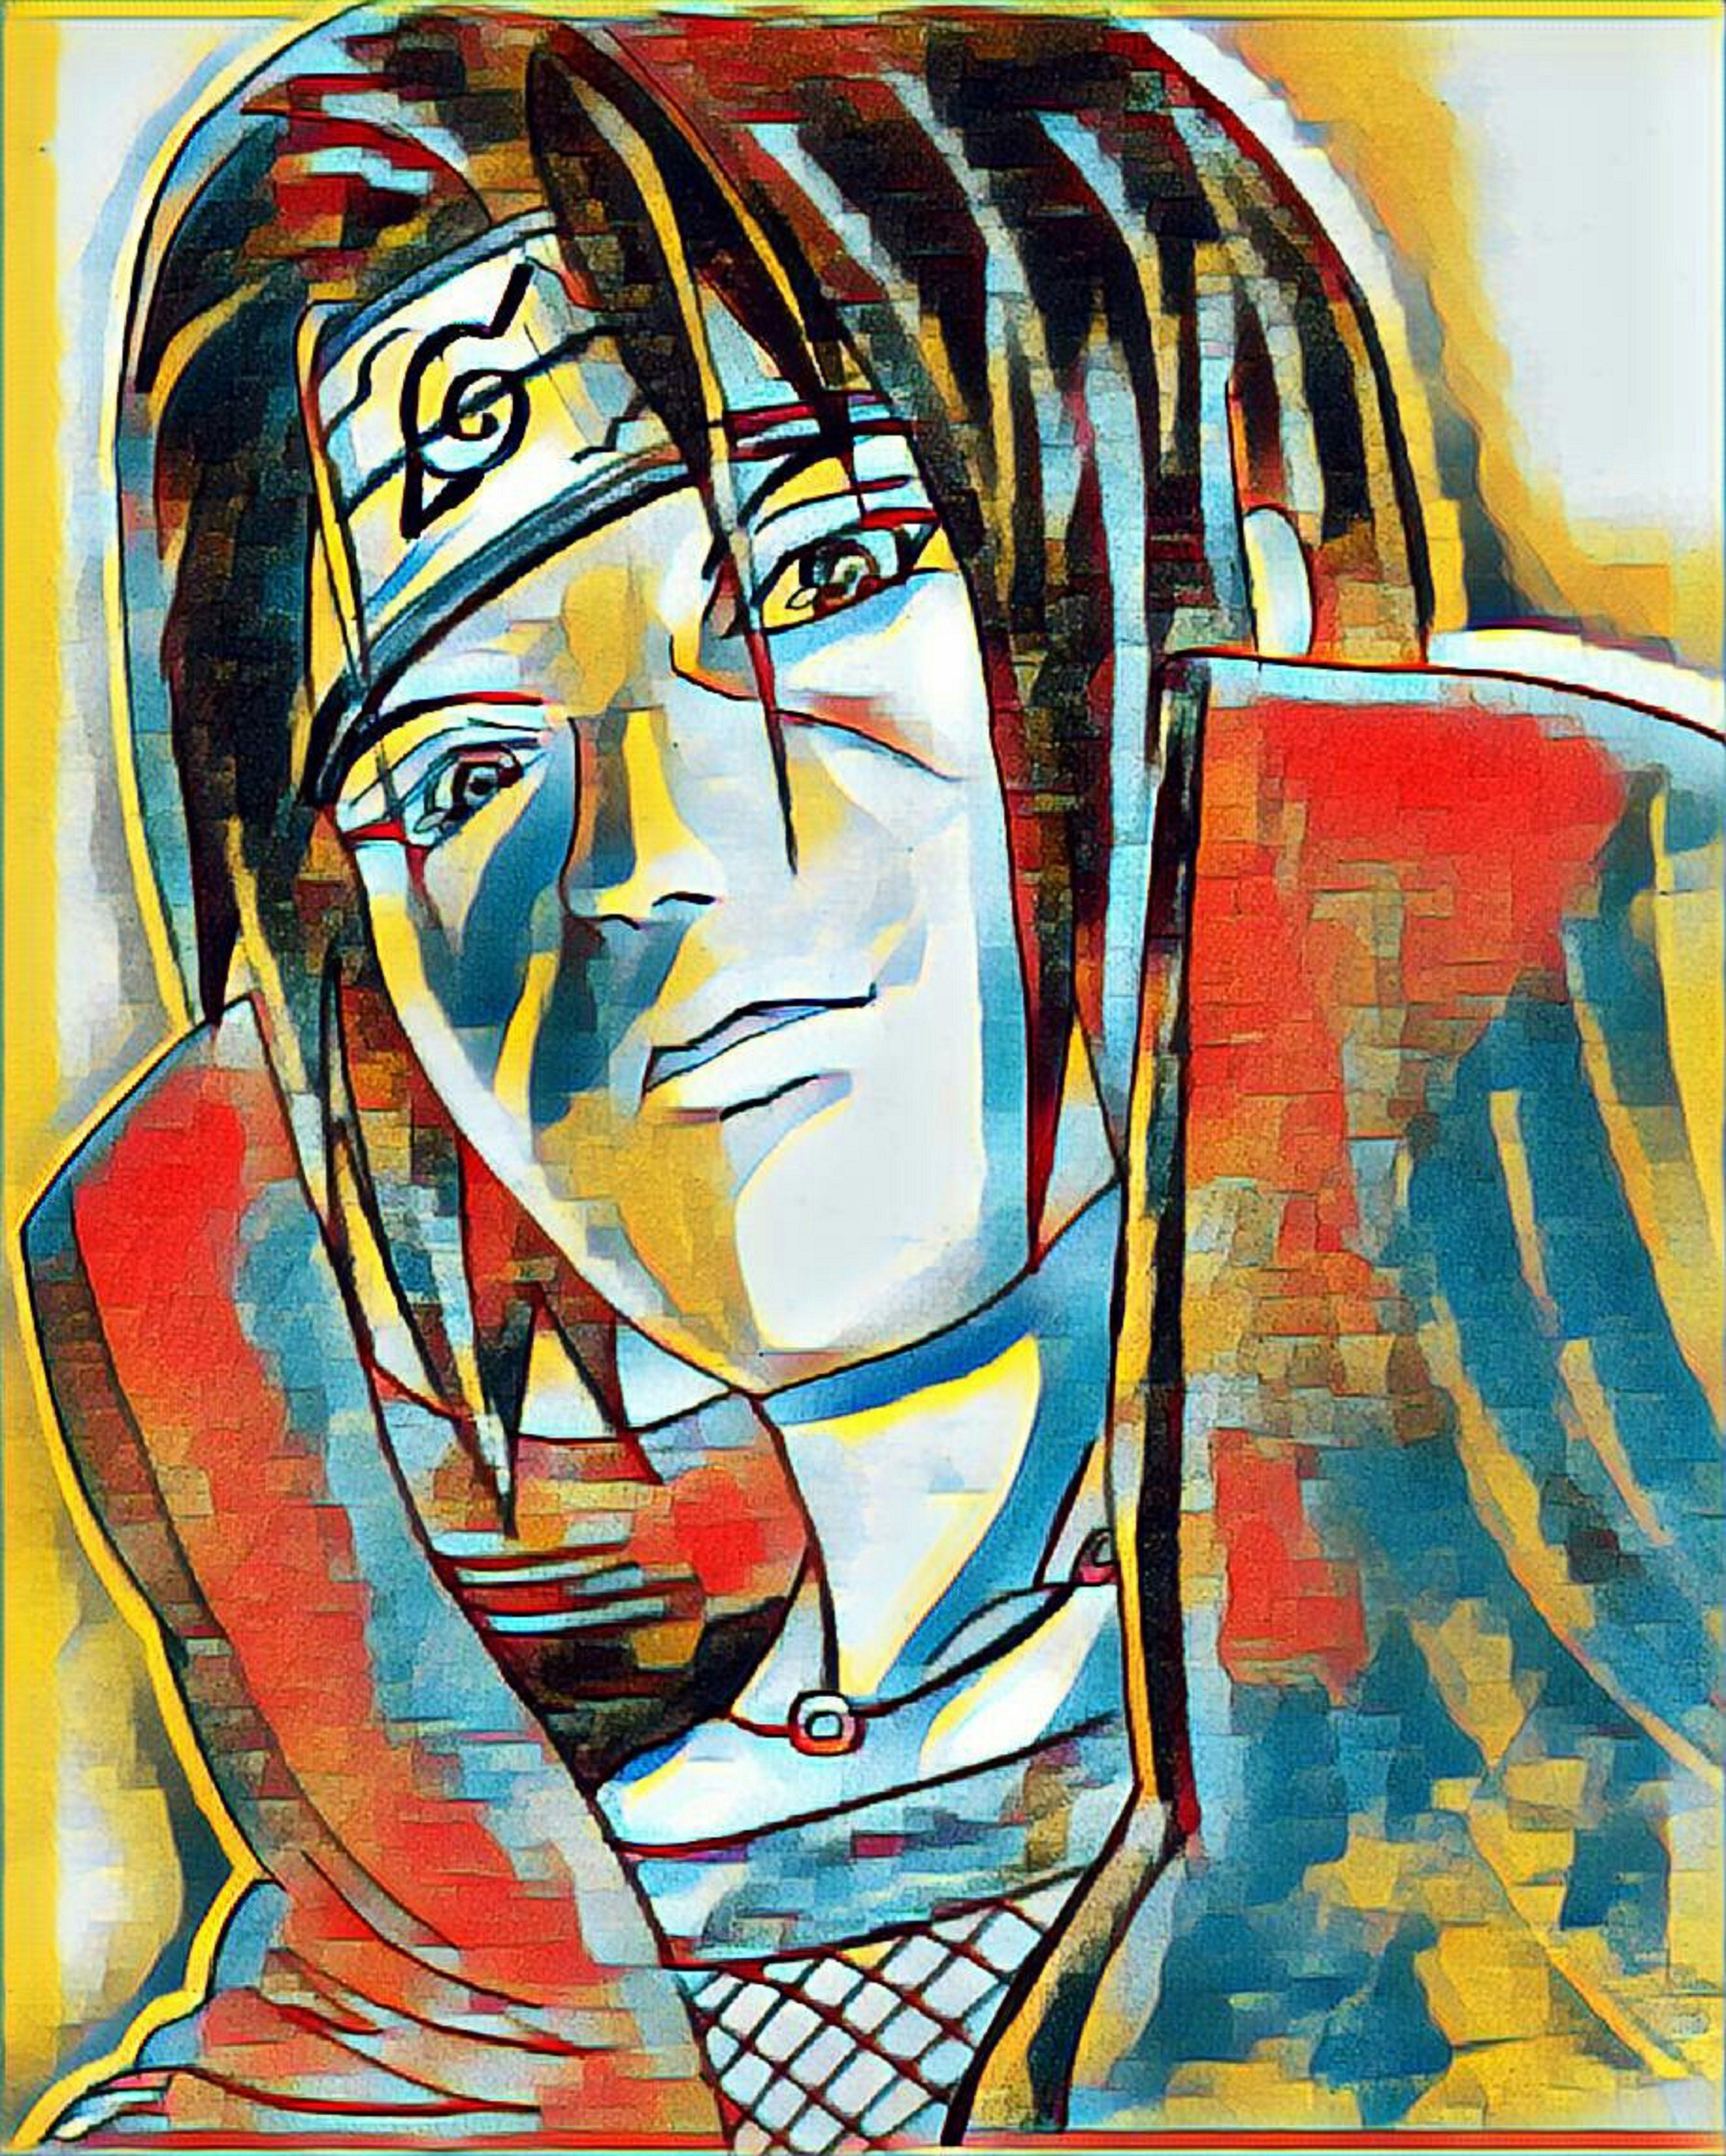 The Best Naruto Series Ninja. Naruto Anime Series